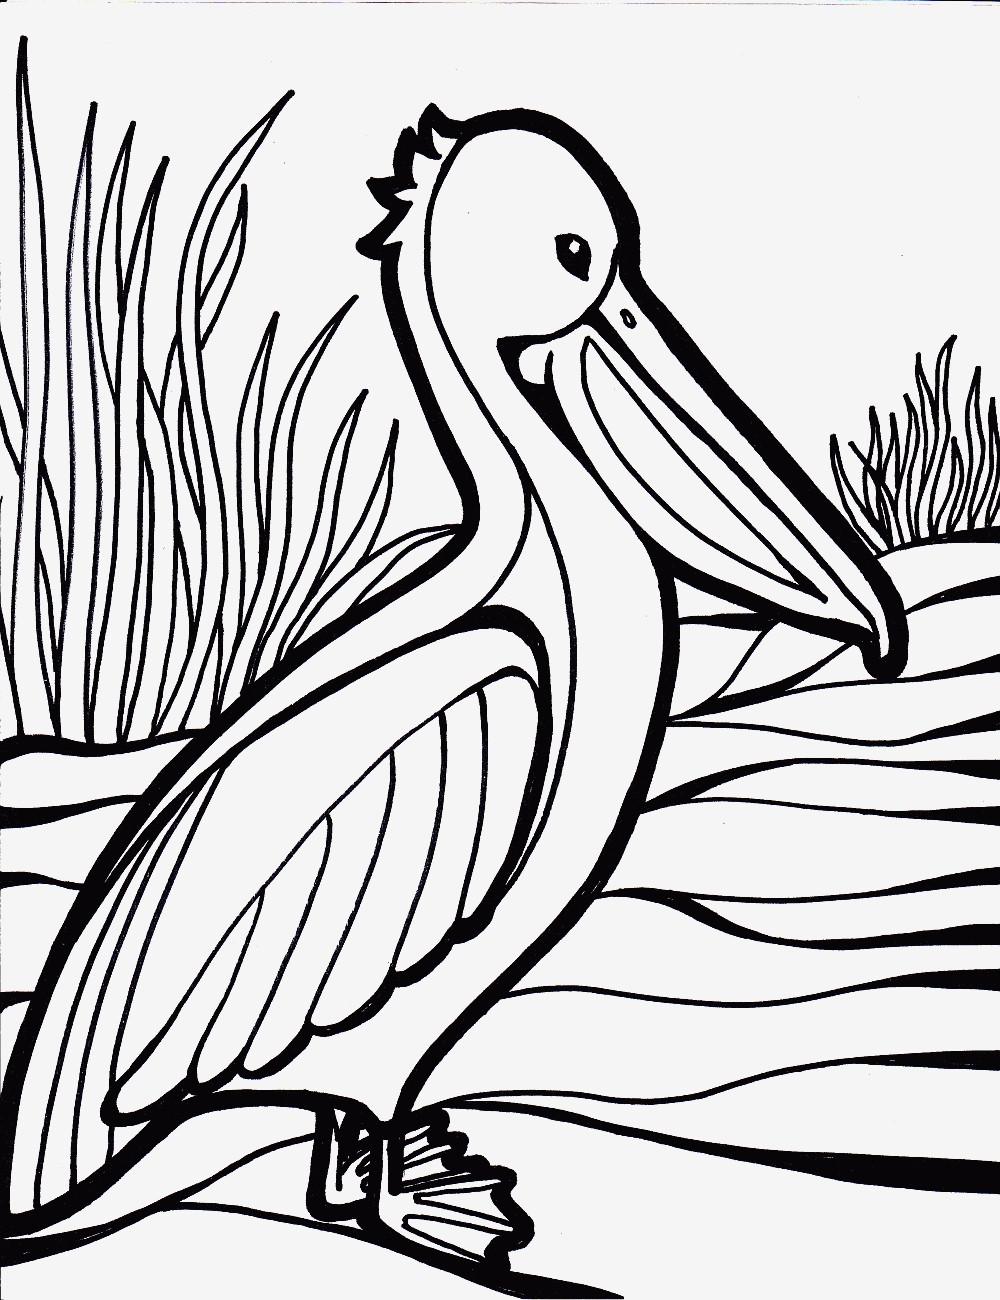 Flamingo Zum Ausmalen Neu Spannende Coloring Bilder Ausmalbild Vogel Bild